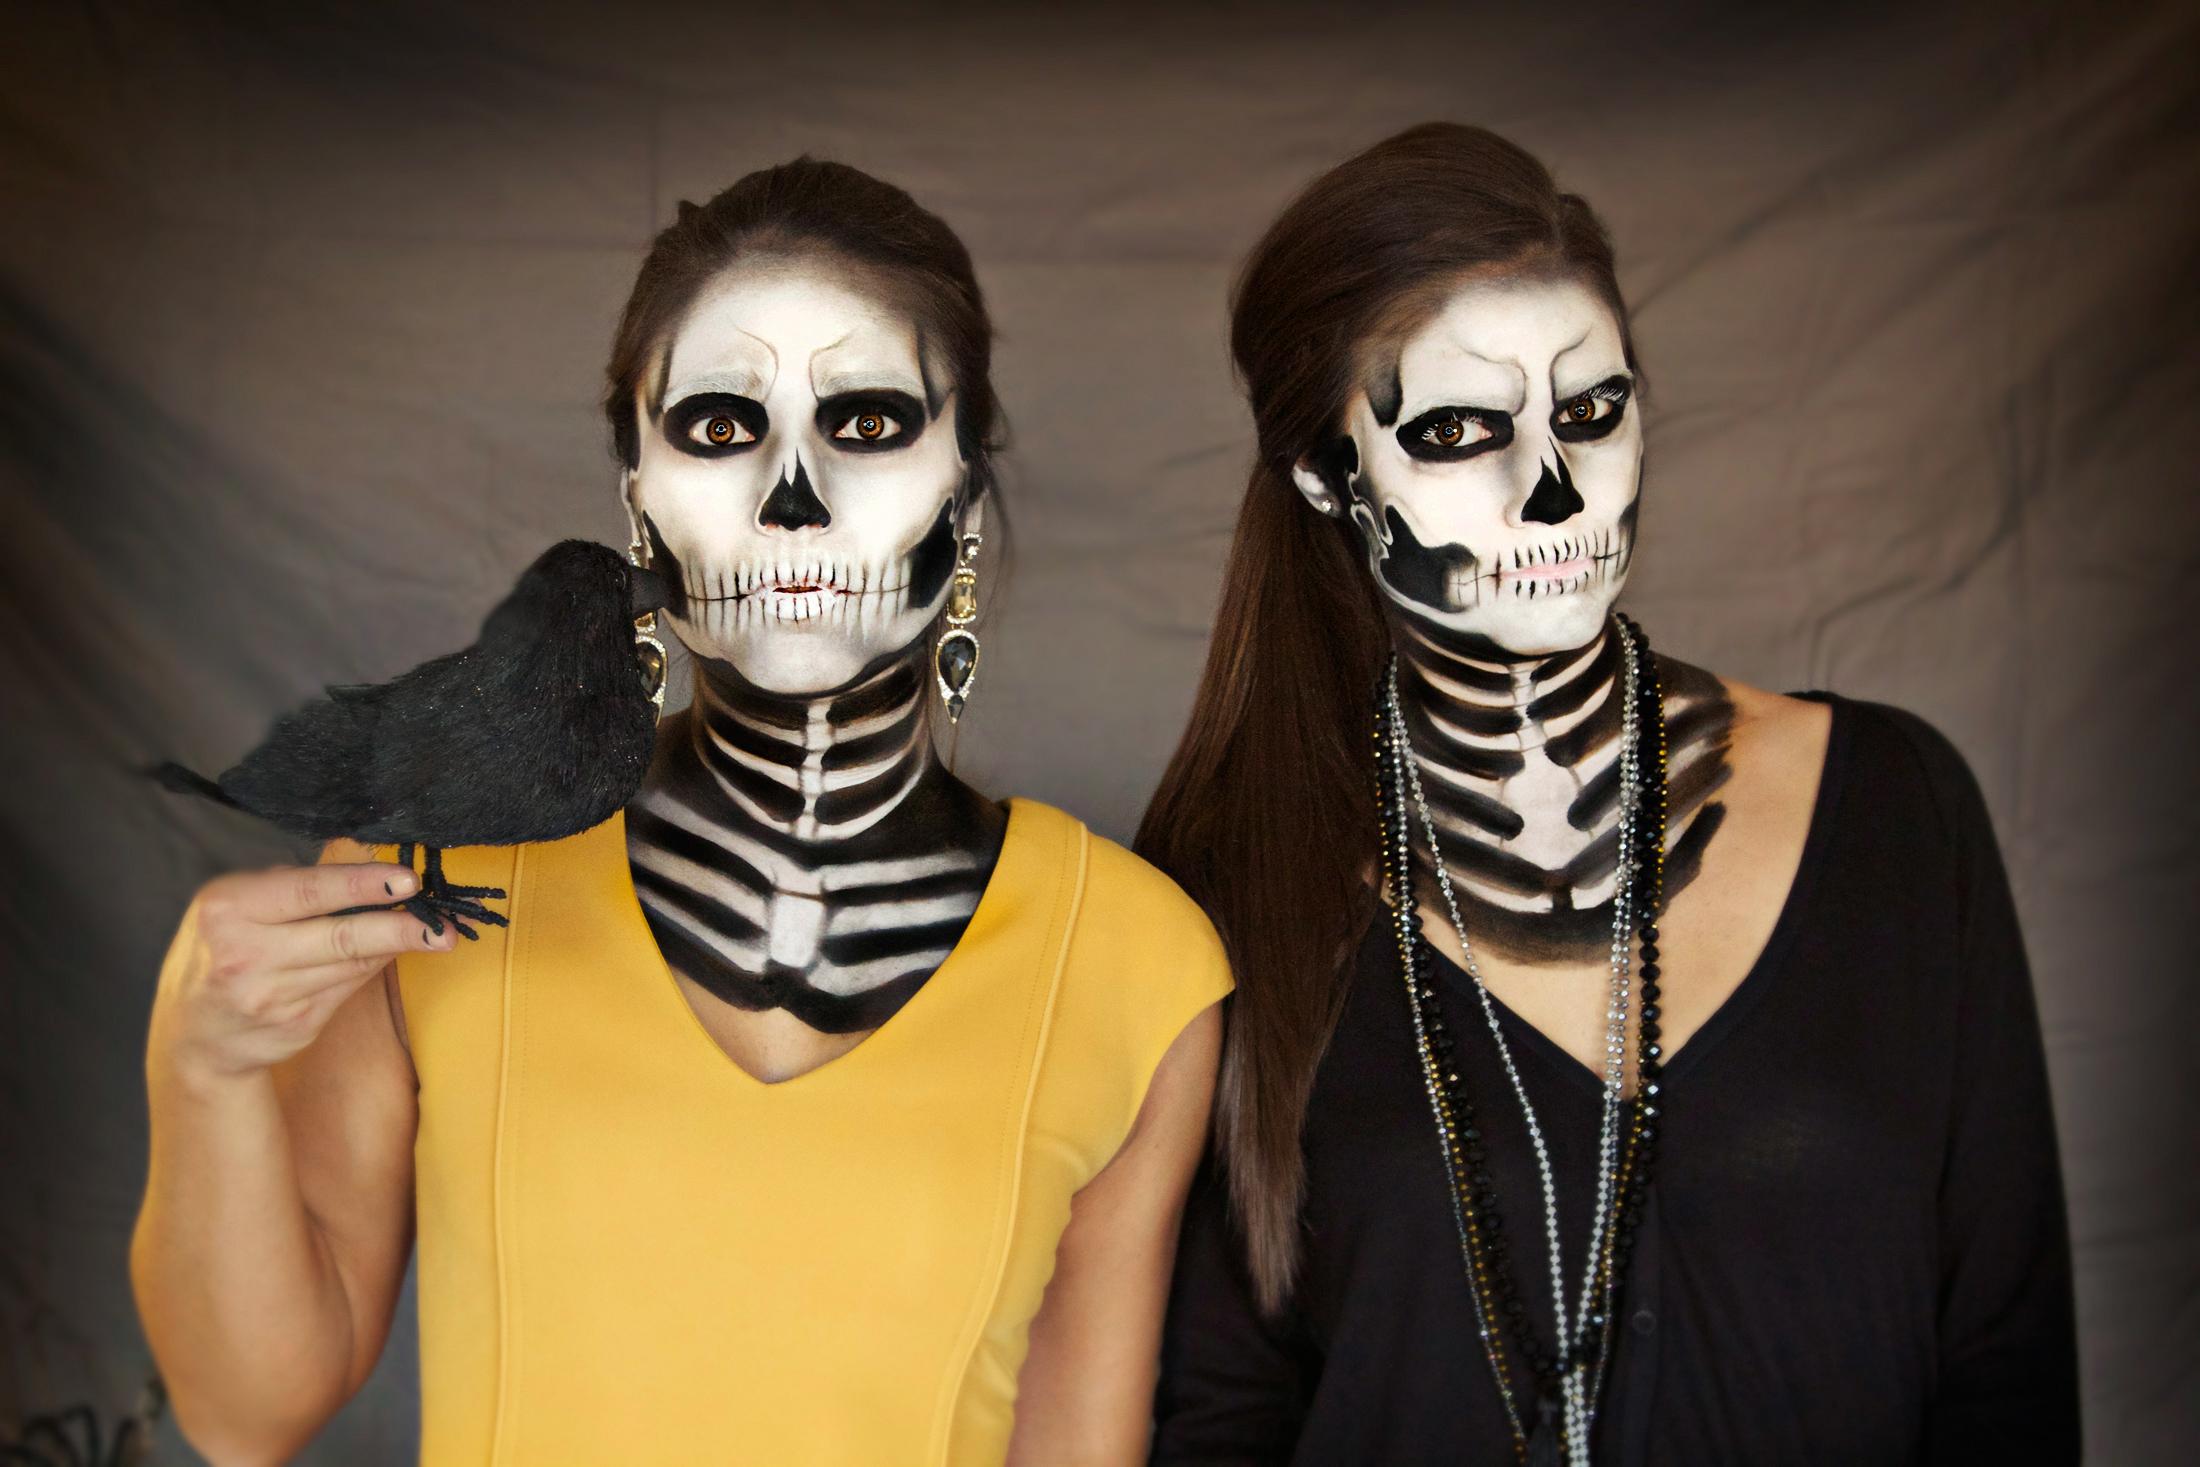 women s creepy twin sister costume halloween lookbook generation bliss